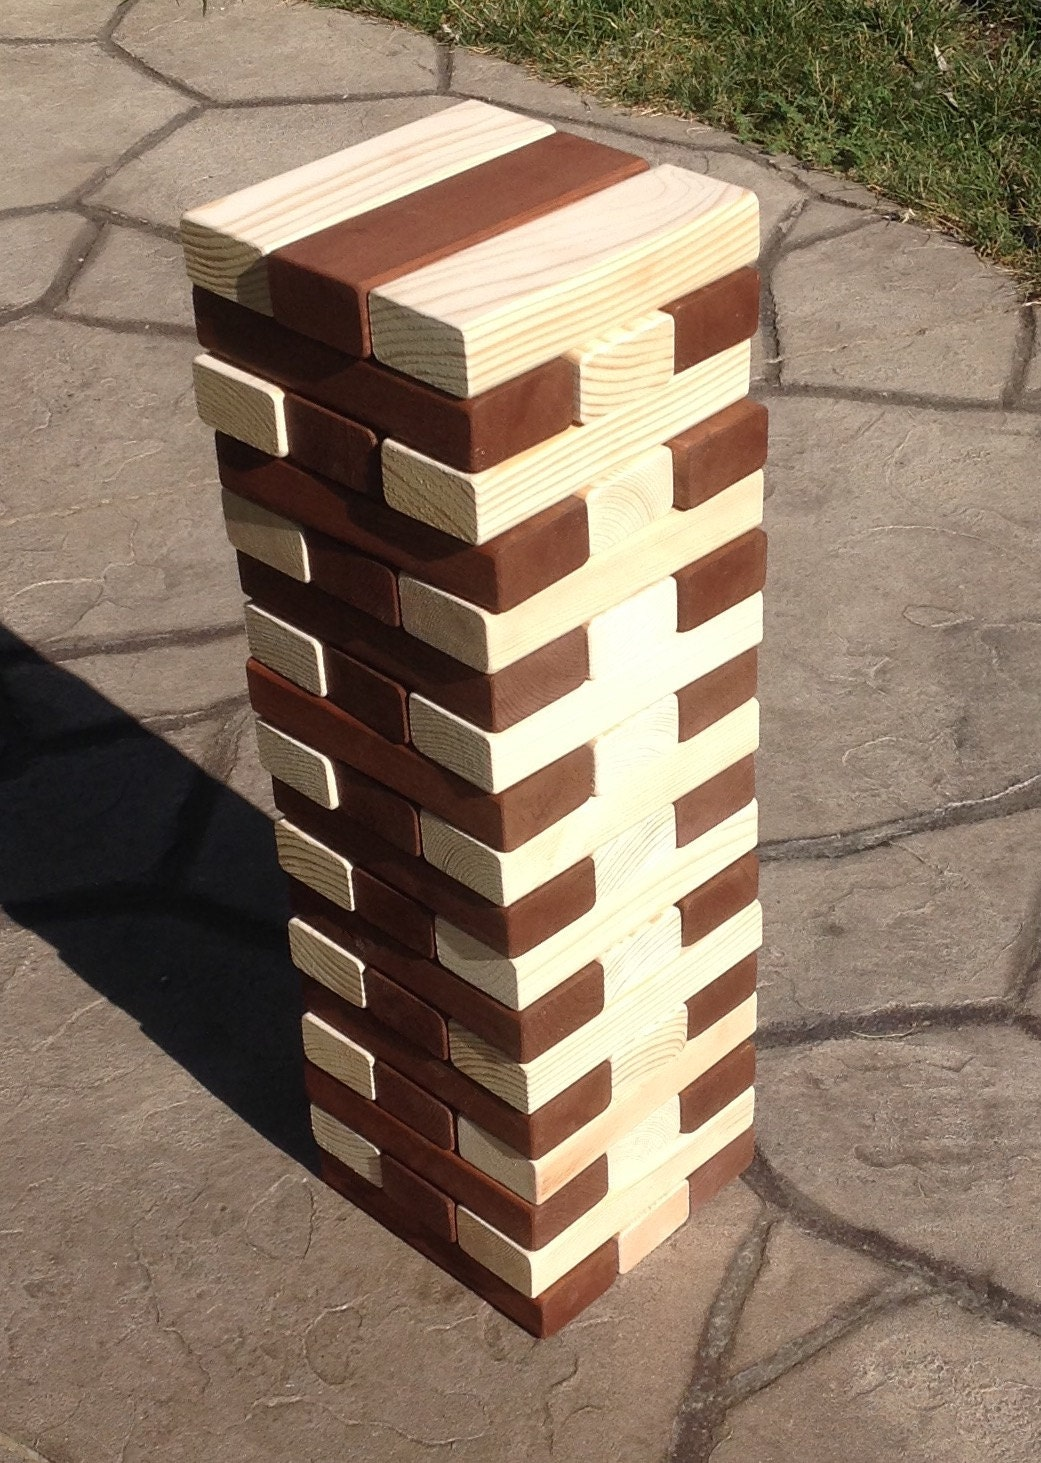 jumbo wood blocks game wooden blocks corporate event game. Black Bedroom Furniture Sets. Home Design Ideas